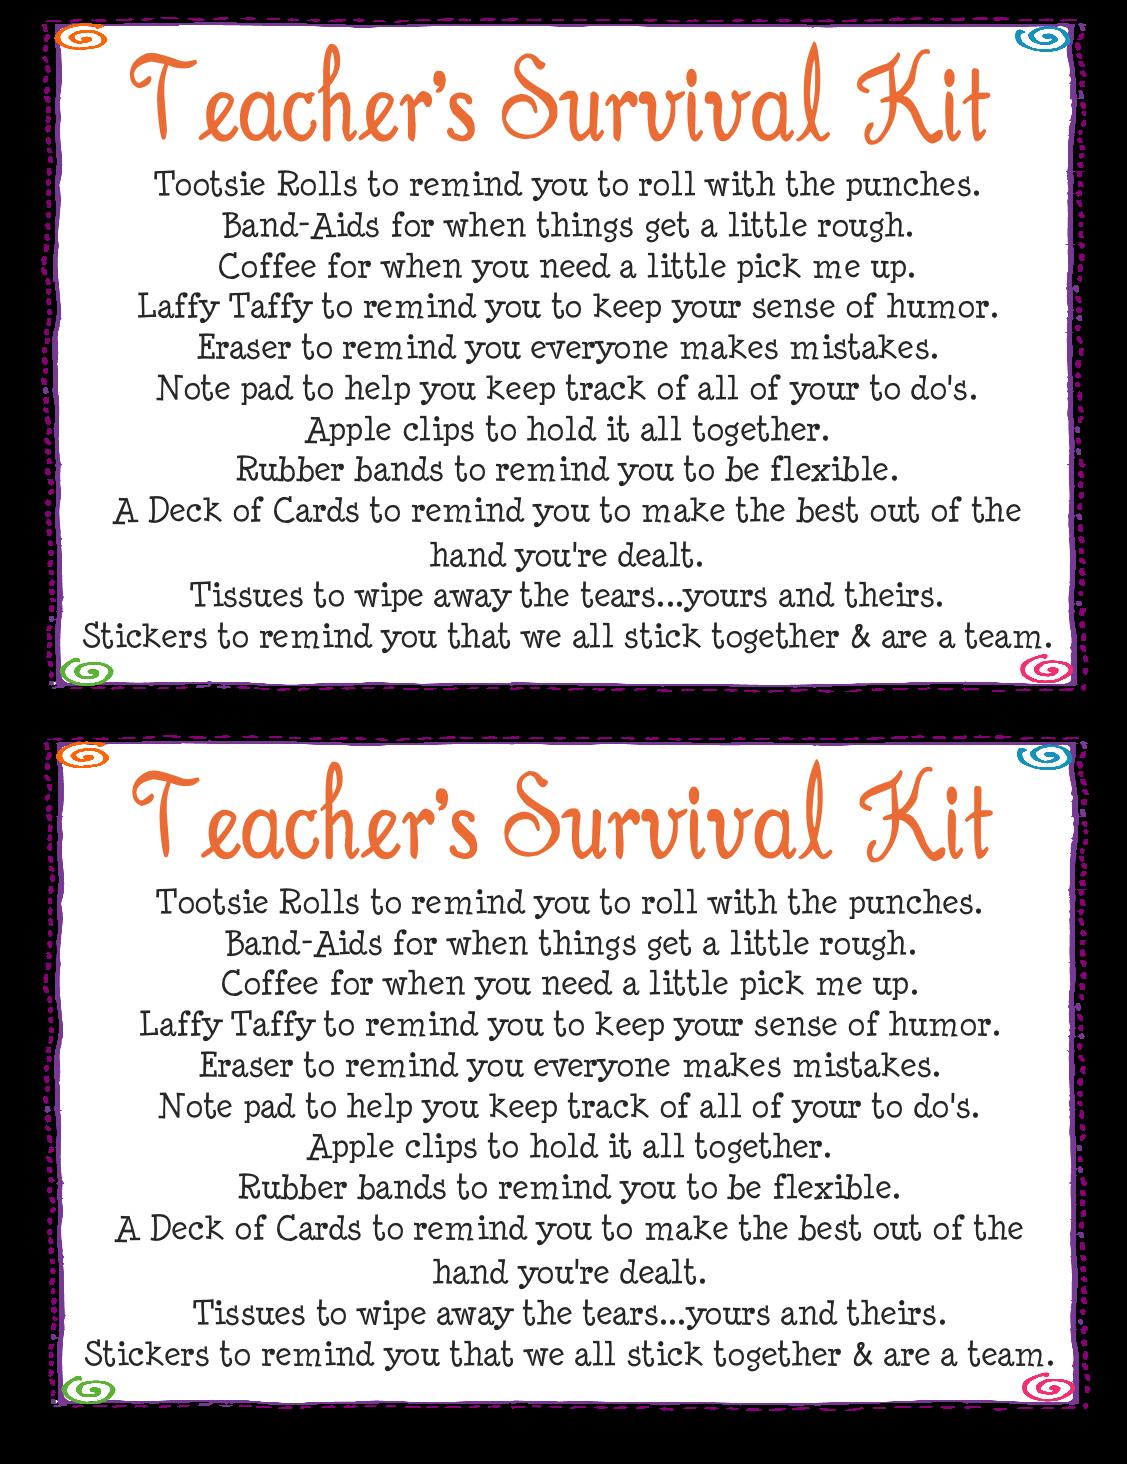 Earthquake clipart survival kit. Teacher kits google search